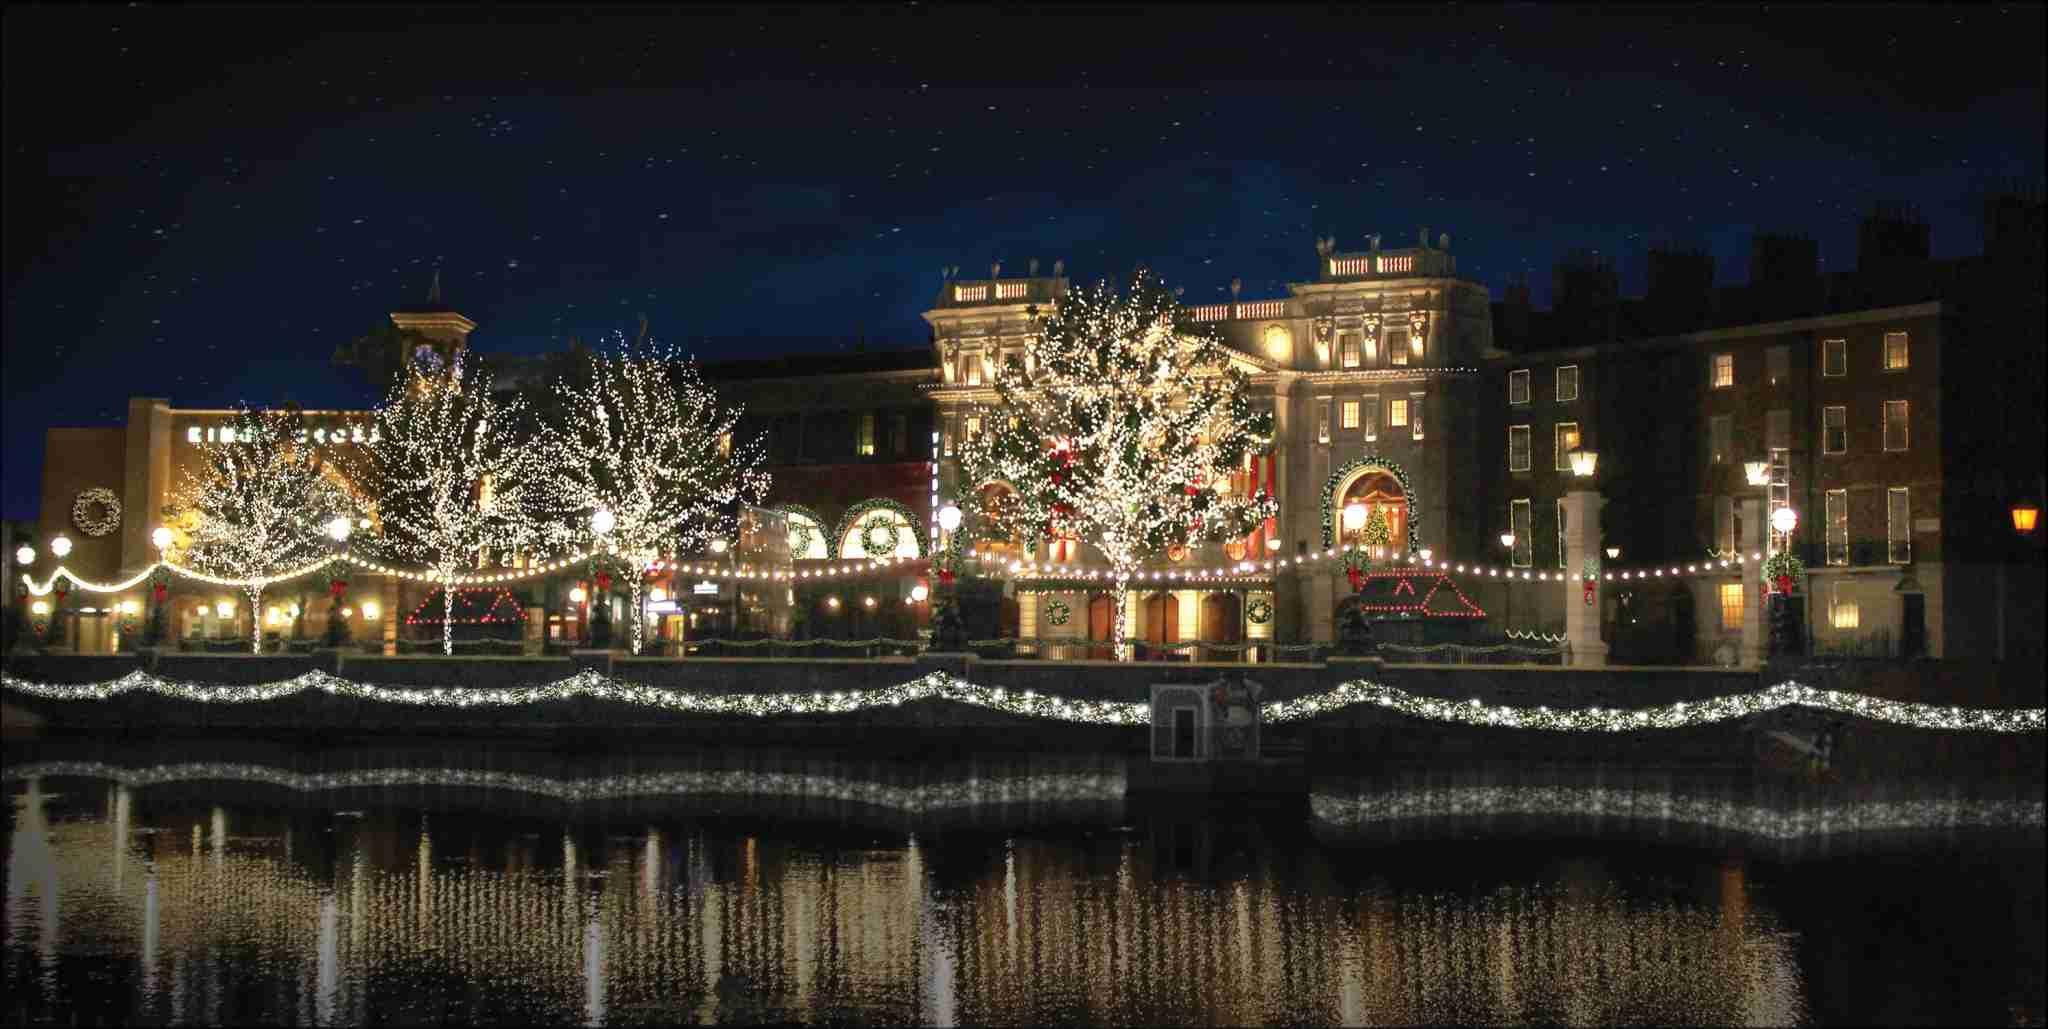 London at Universal Studios Florida. Image courtesy of Universal Orlando Resort.